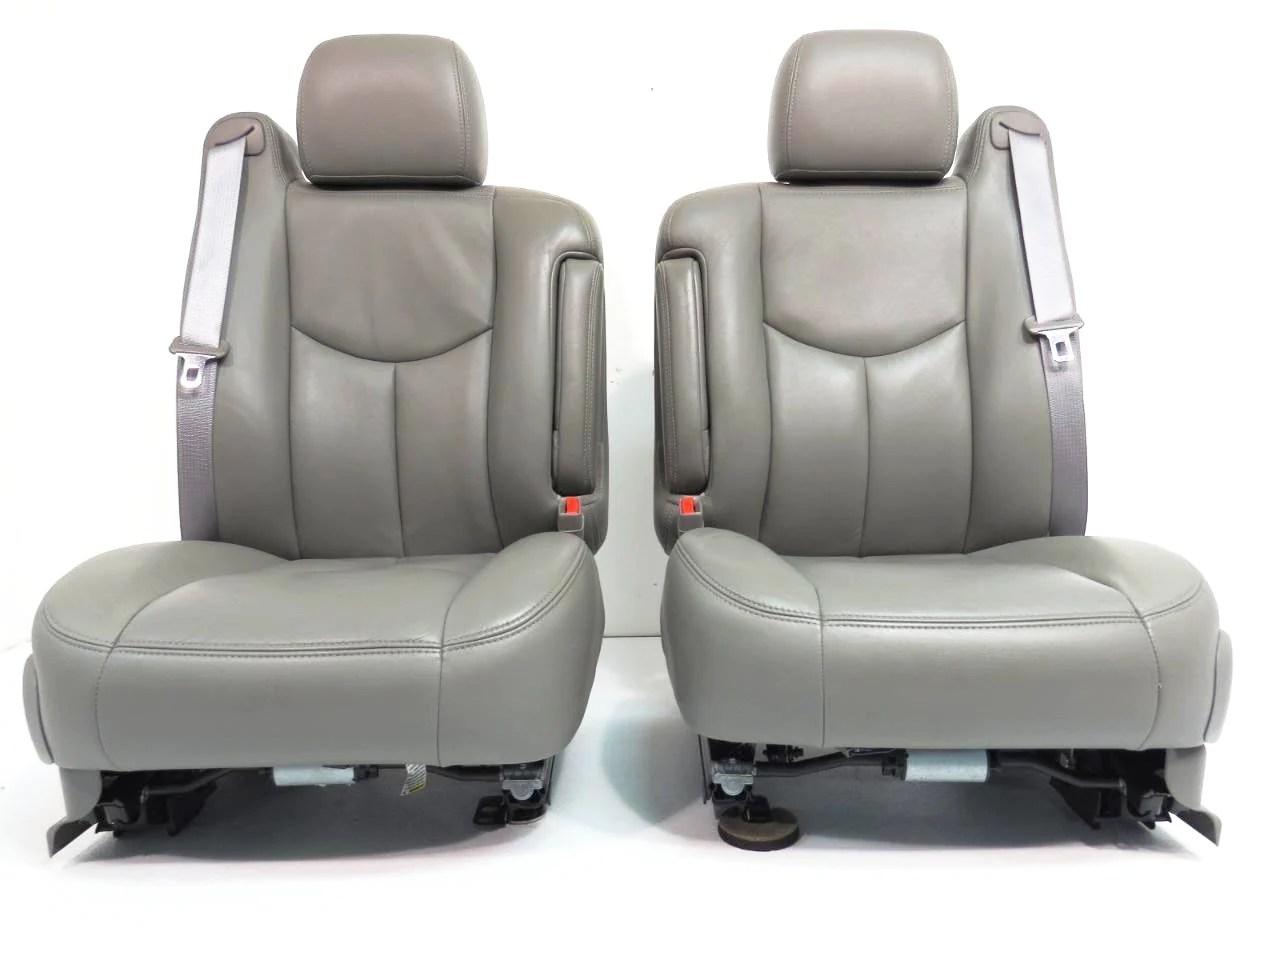 small resolution of  chevy gmc silverado sierra tahoe yukon suburban oem leather seats pewter grey 2000 2001 2002 2003